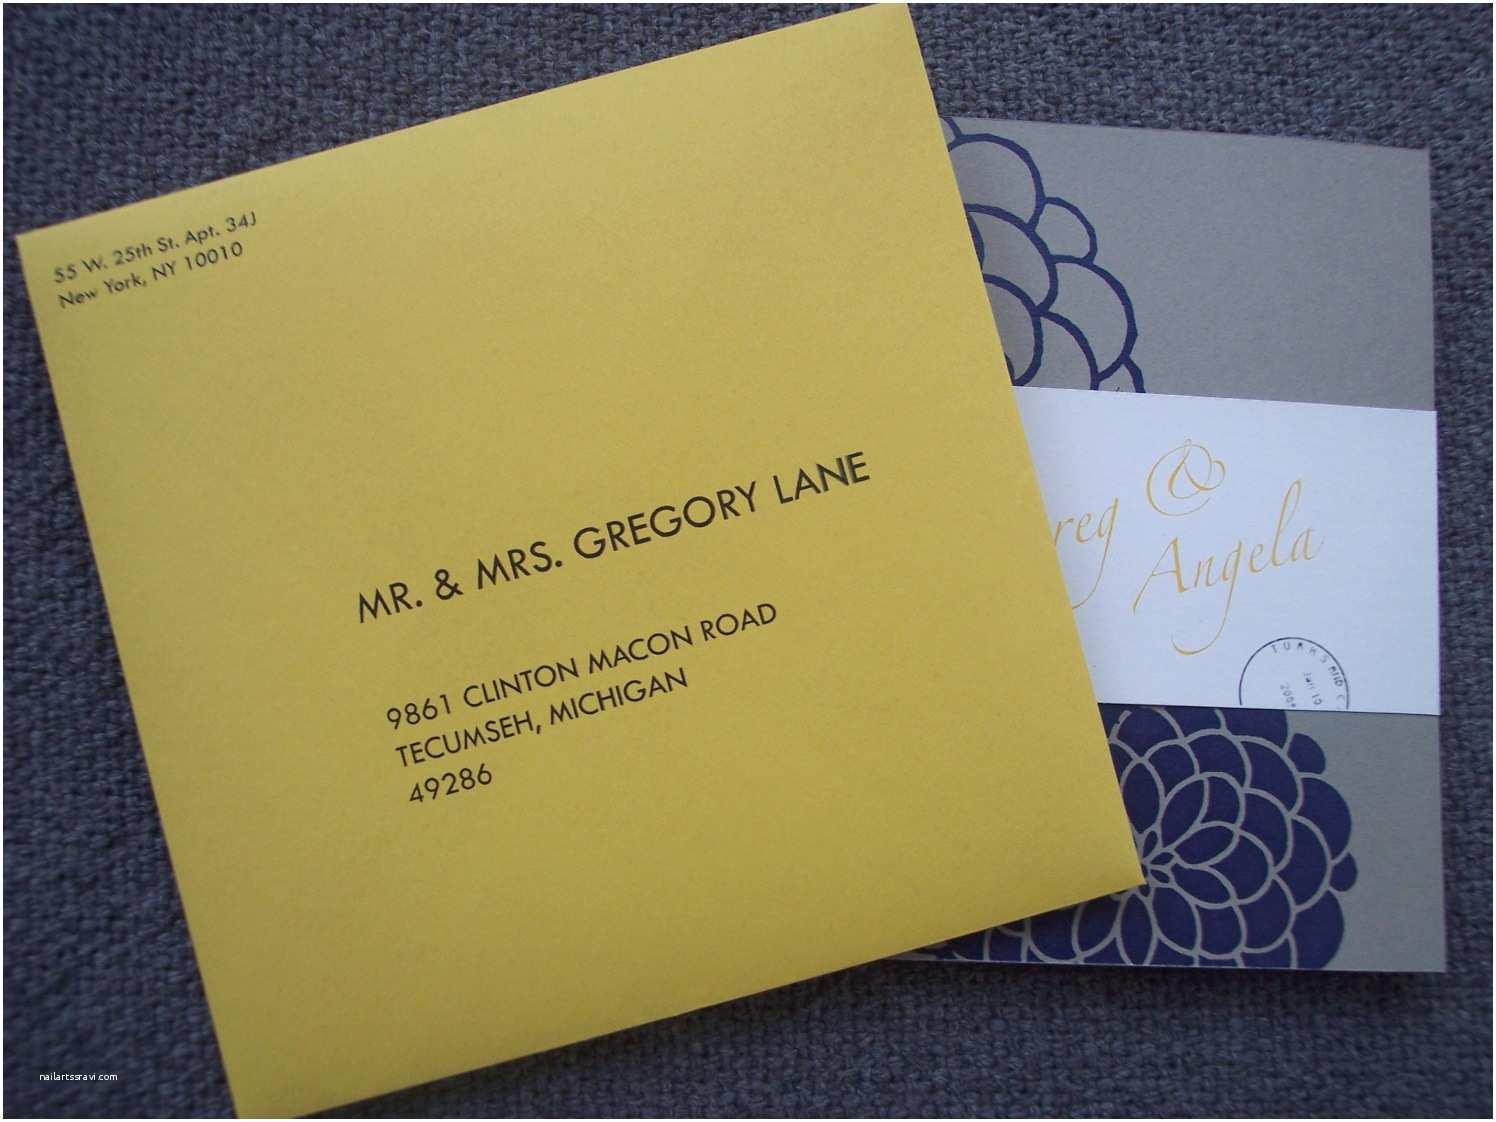 Wedding Invitations with Response Cards and Envelopes Multi Patterned Destination Pocketfold Invitation